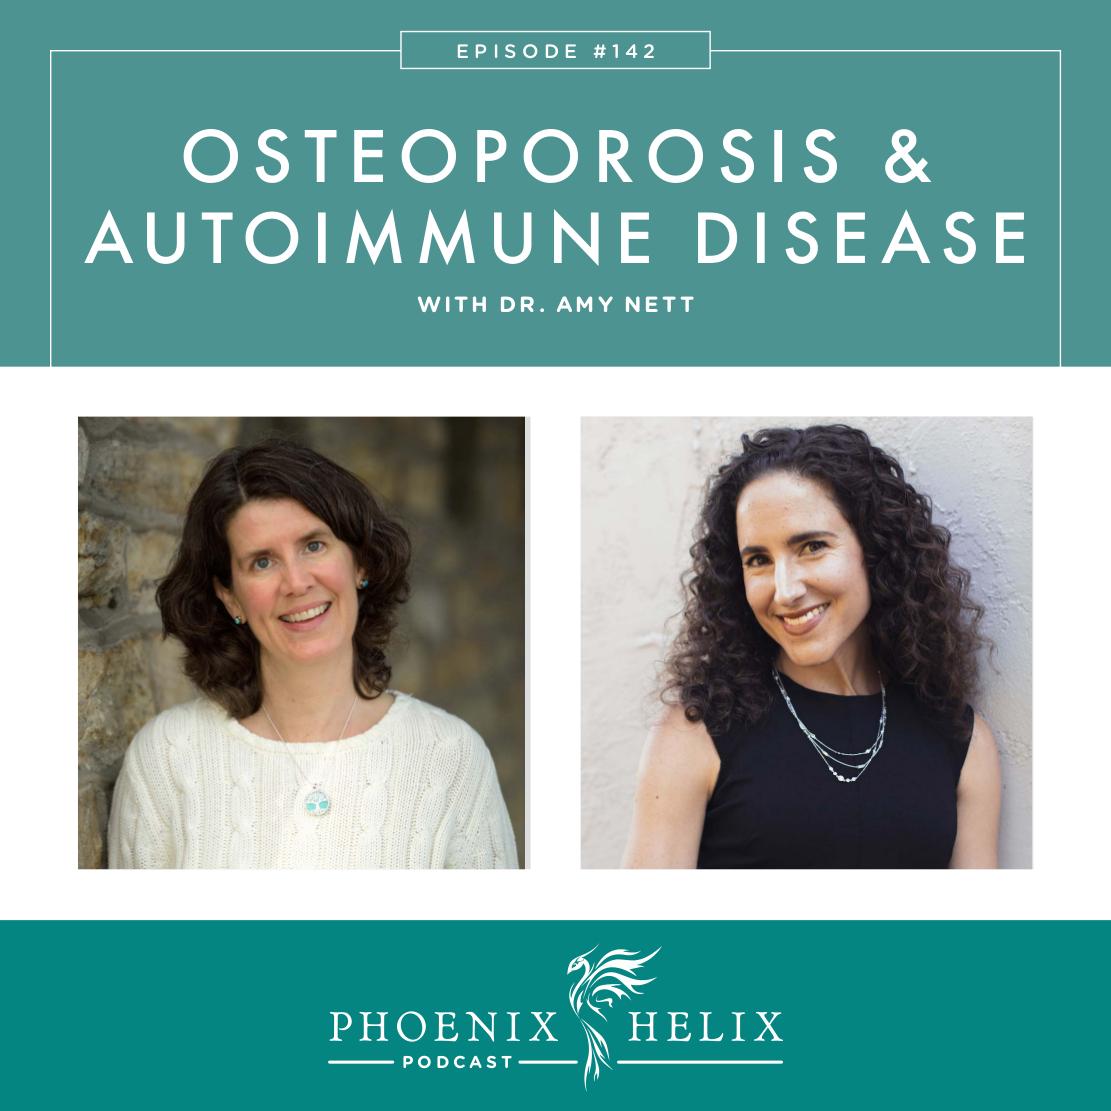 Osteoporosis & Autoimmune Disease with Dr. Amy Nett | Phoenix Helix Podcast